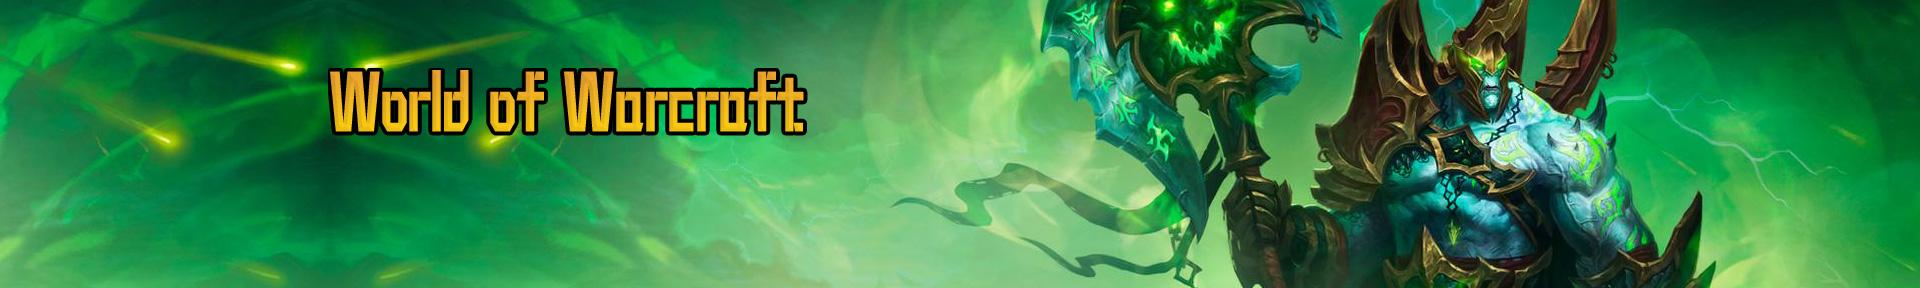 World of Warcraft Gold US